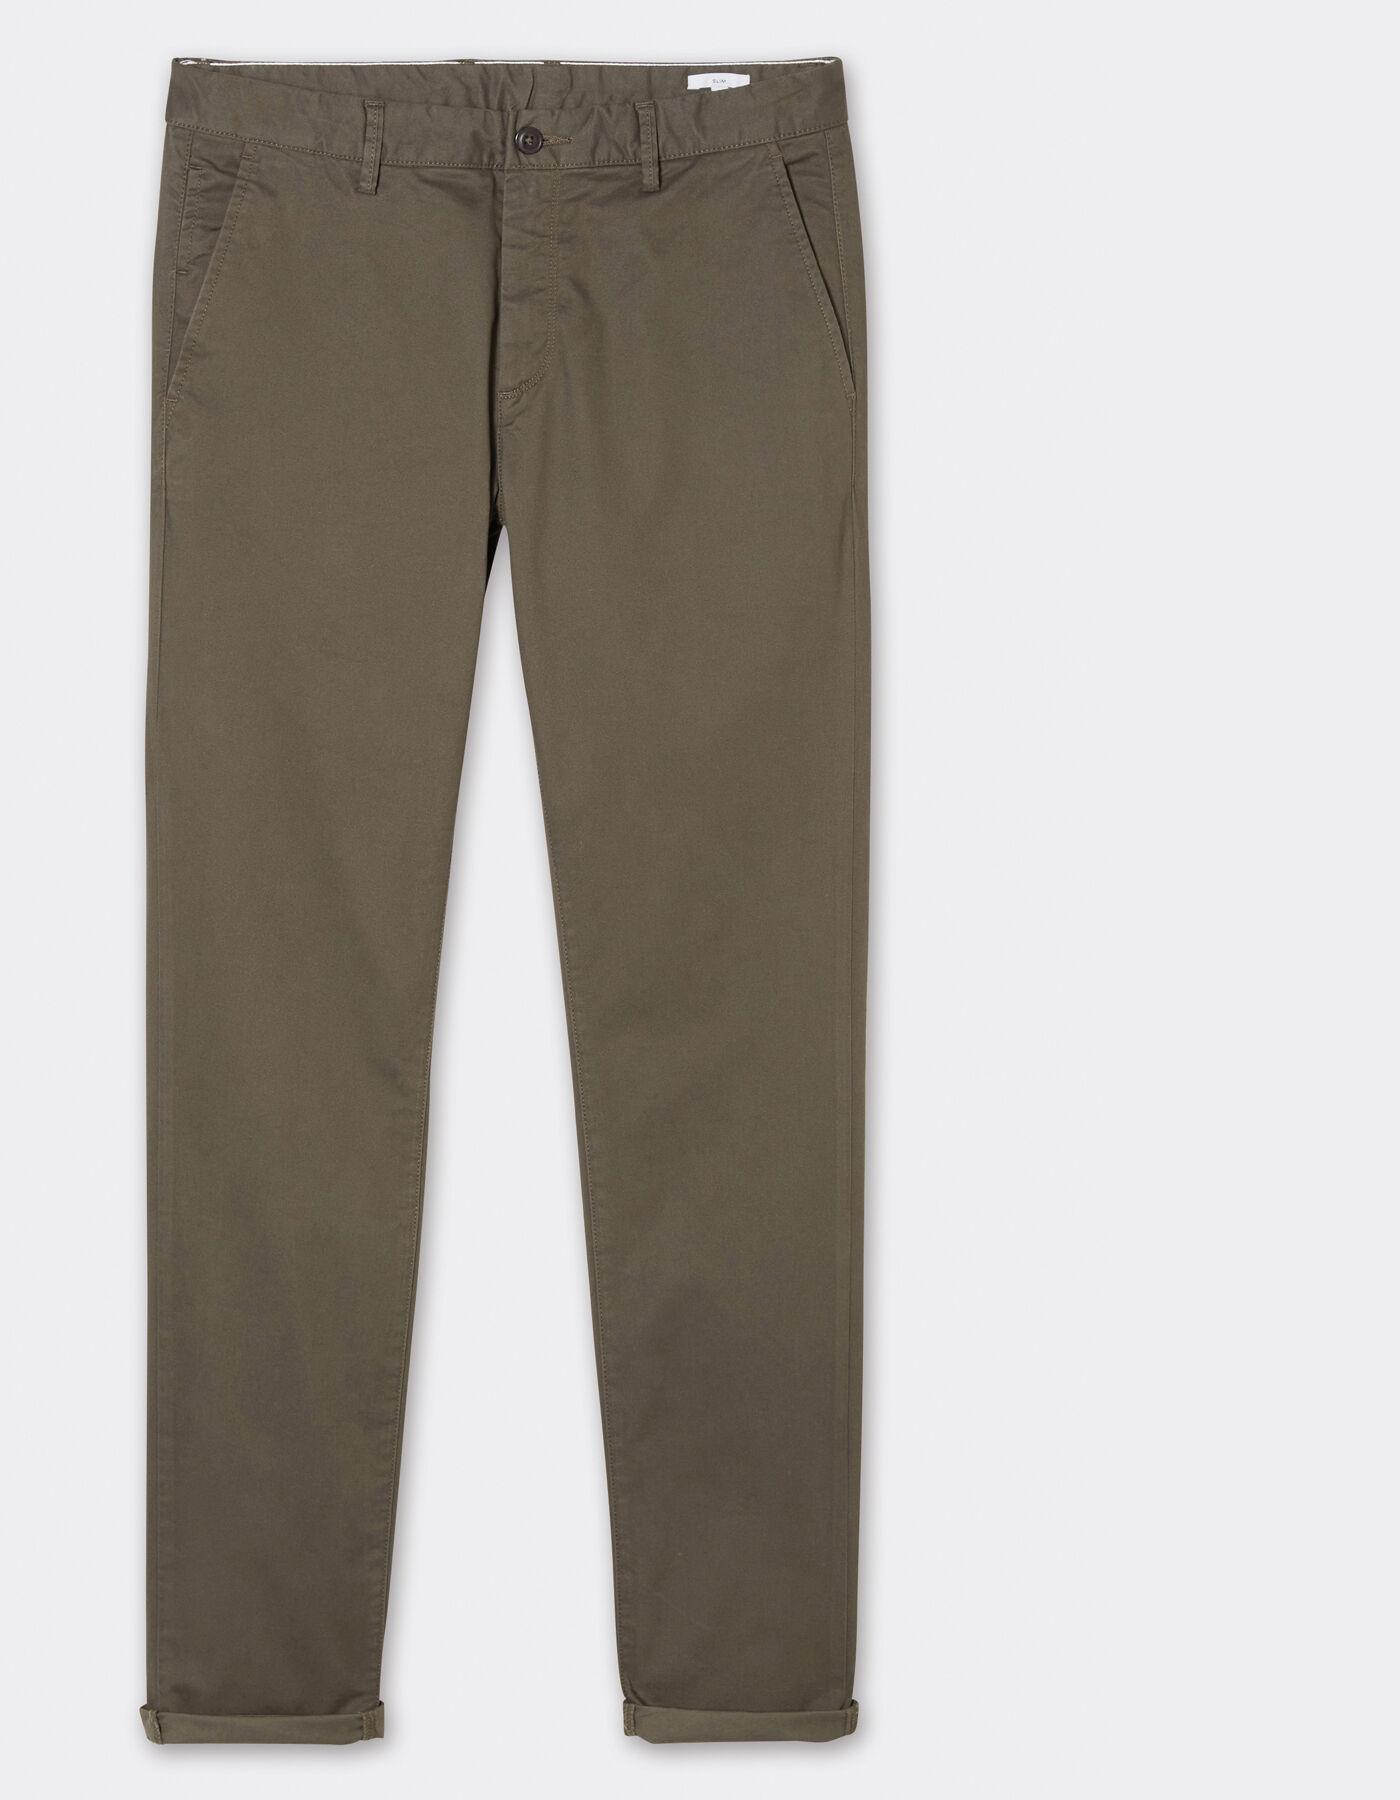 pantalon chino slim coton stretch kaki homme jules. Black Bedroom Furniture Sets. Home Design Ideas